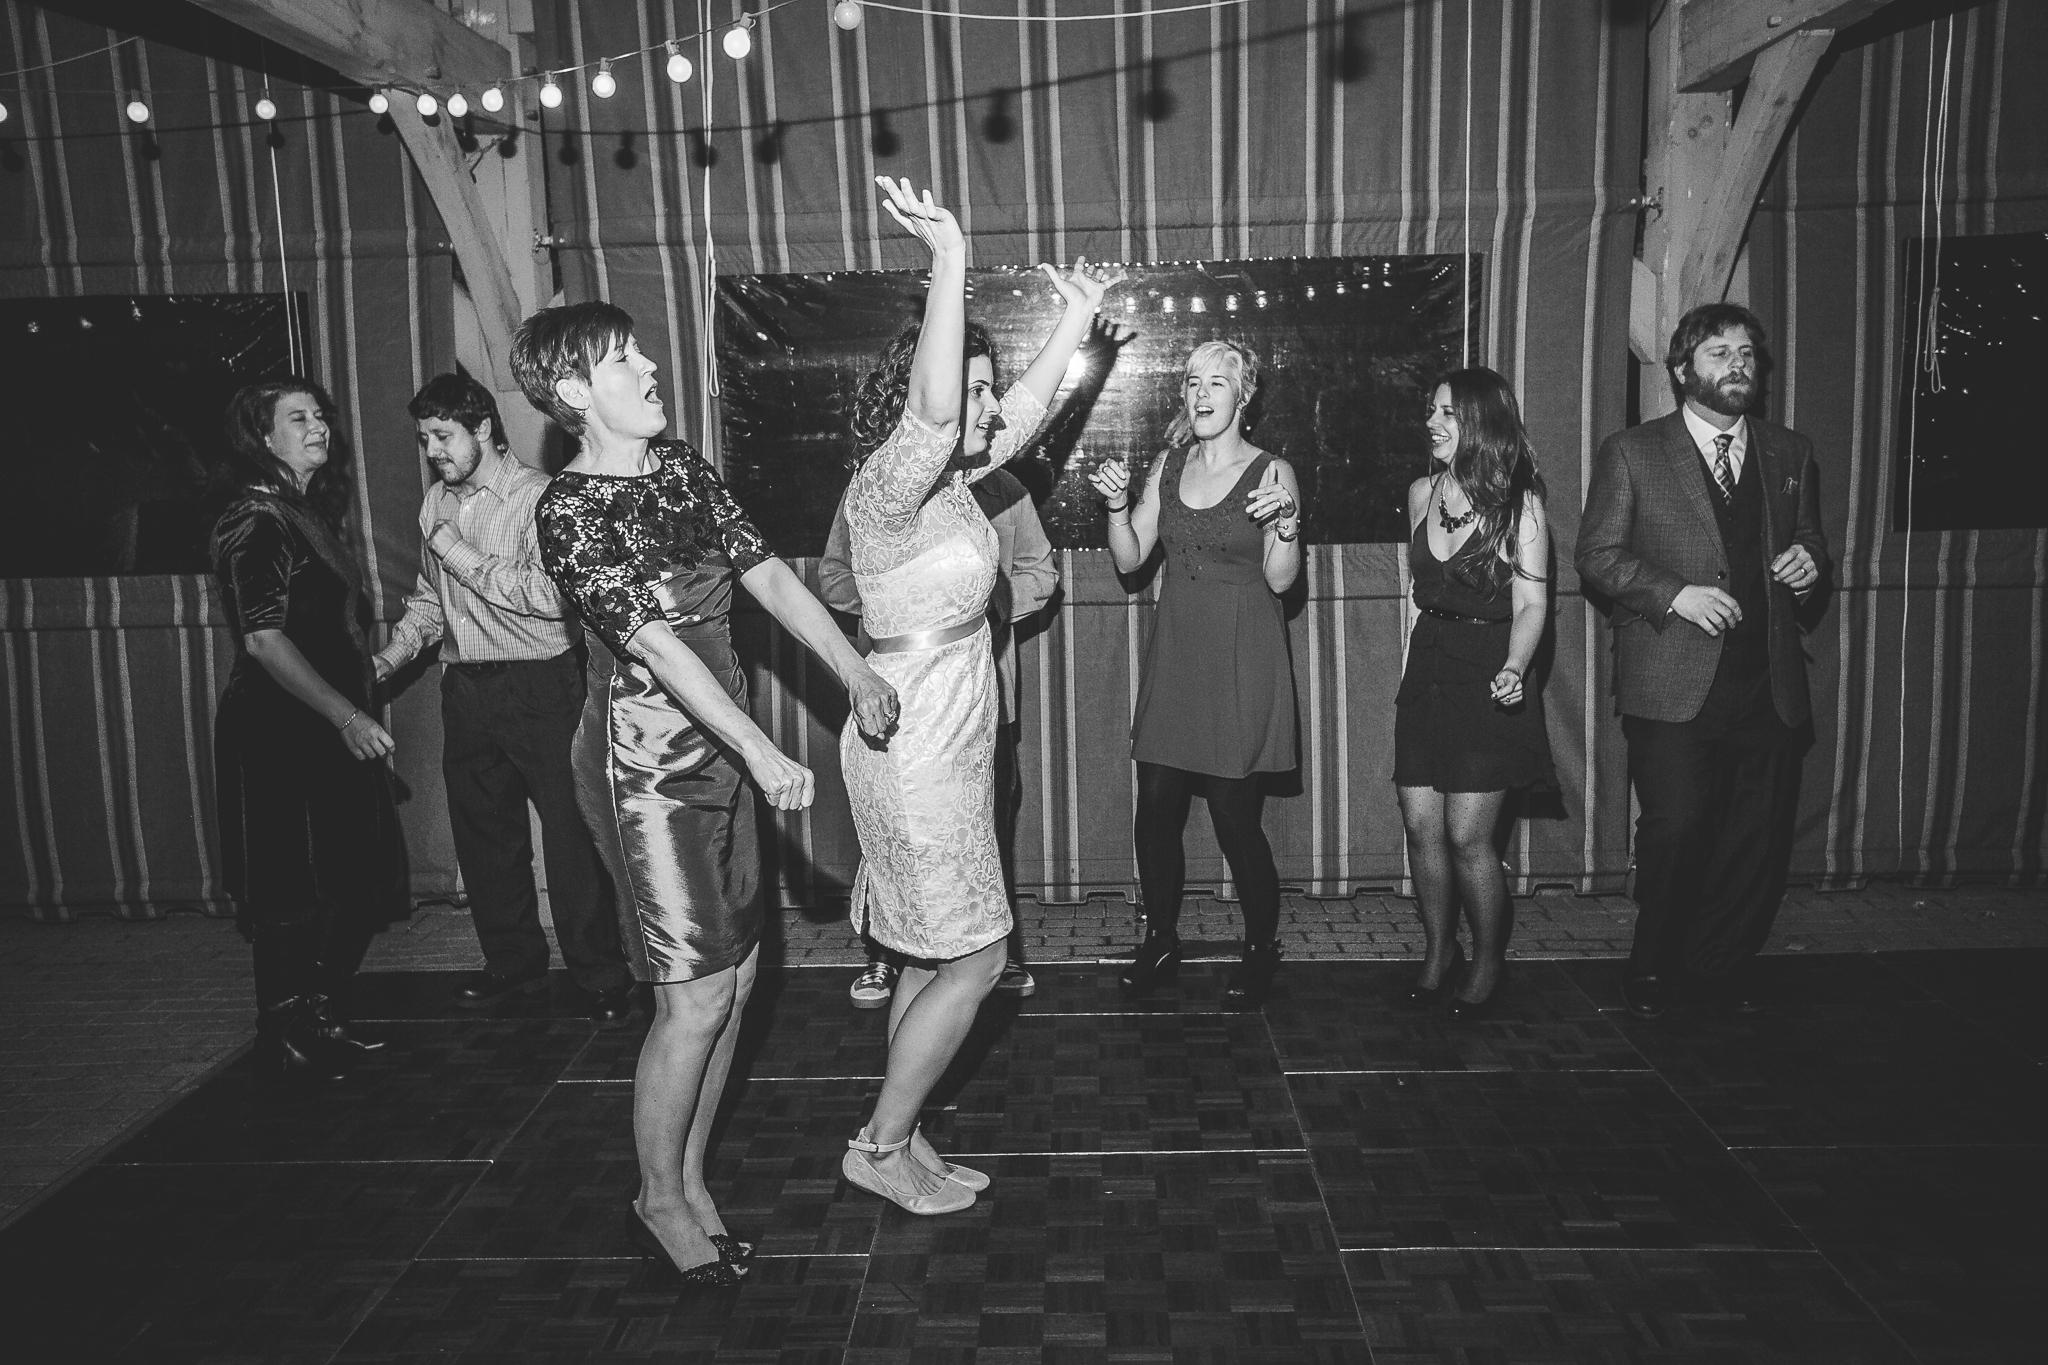 camuglia-whomstudio-chelsea_and_andy-nycphotographer-wedding-brooklyn-buffalo-timberlodge-168-5739.jpg